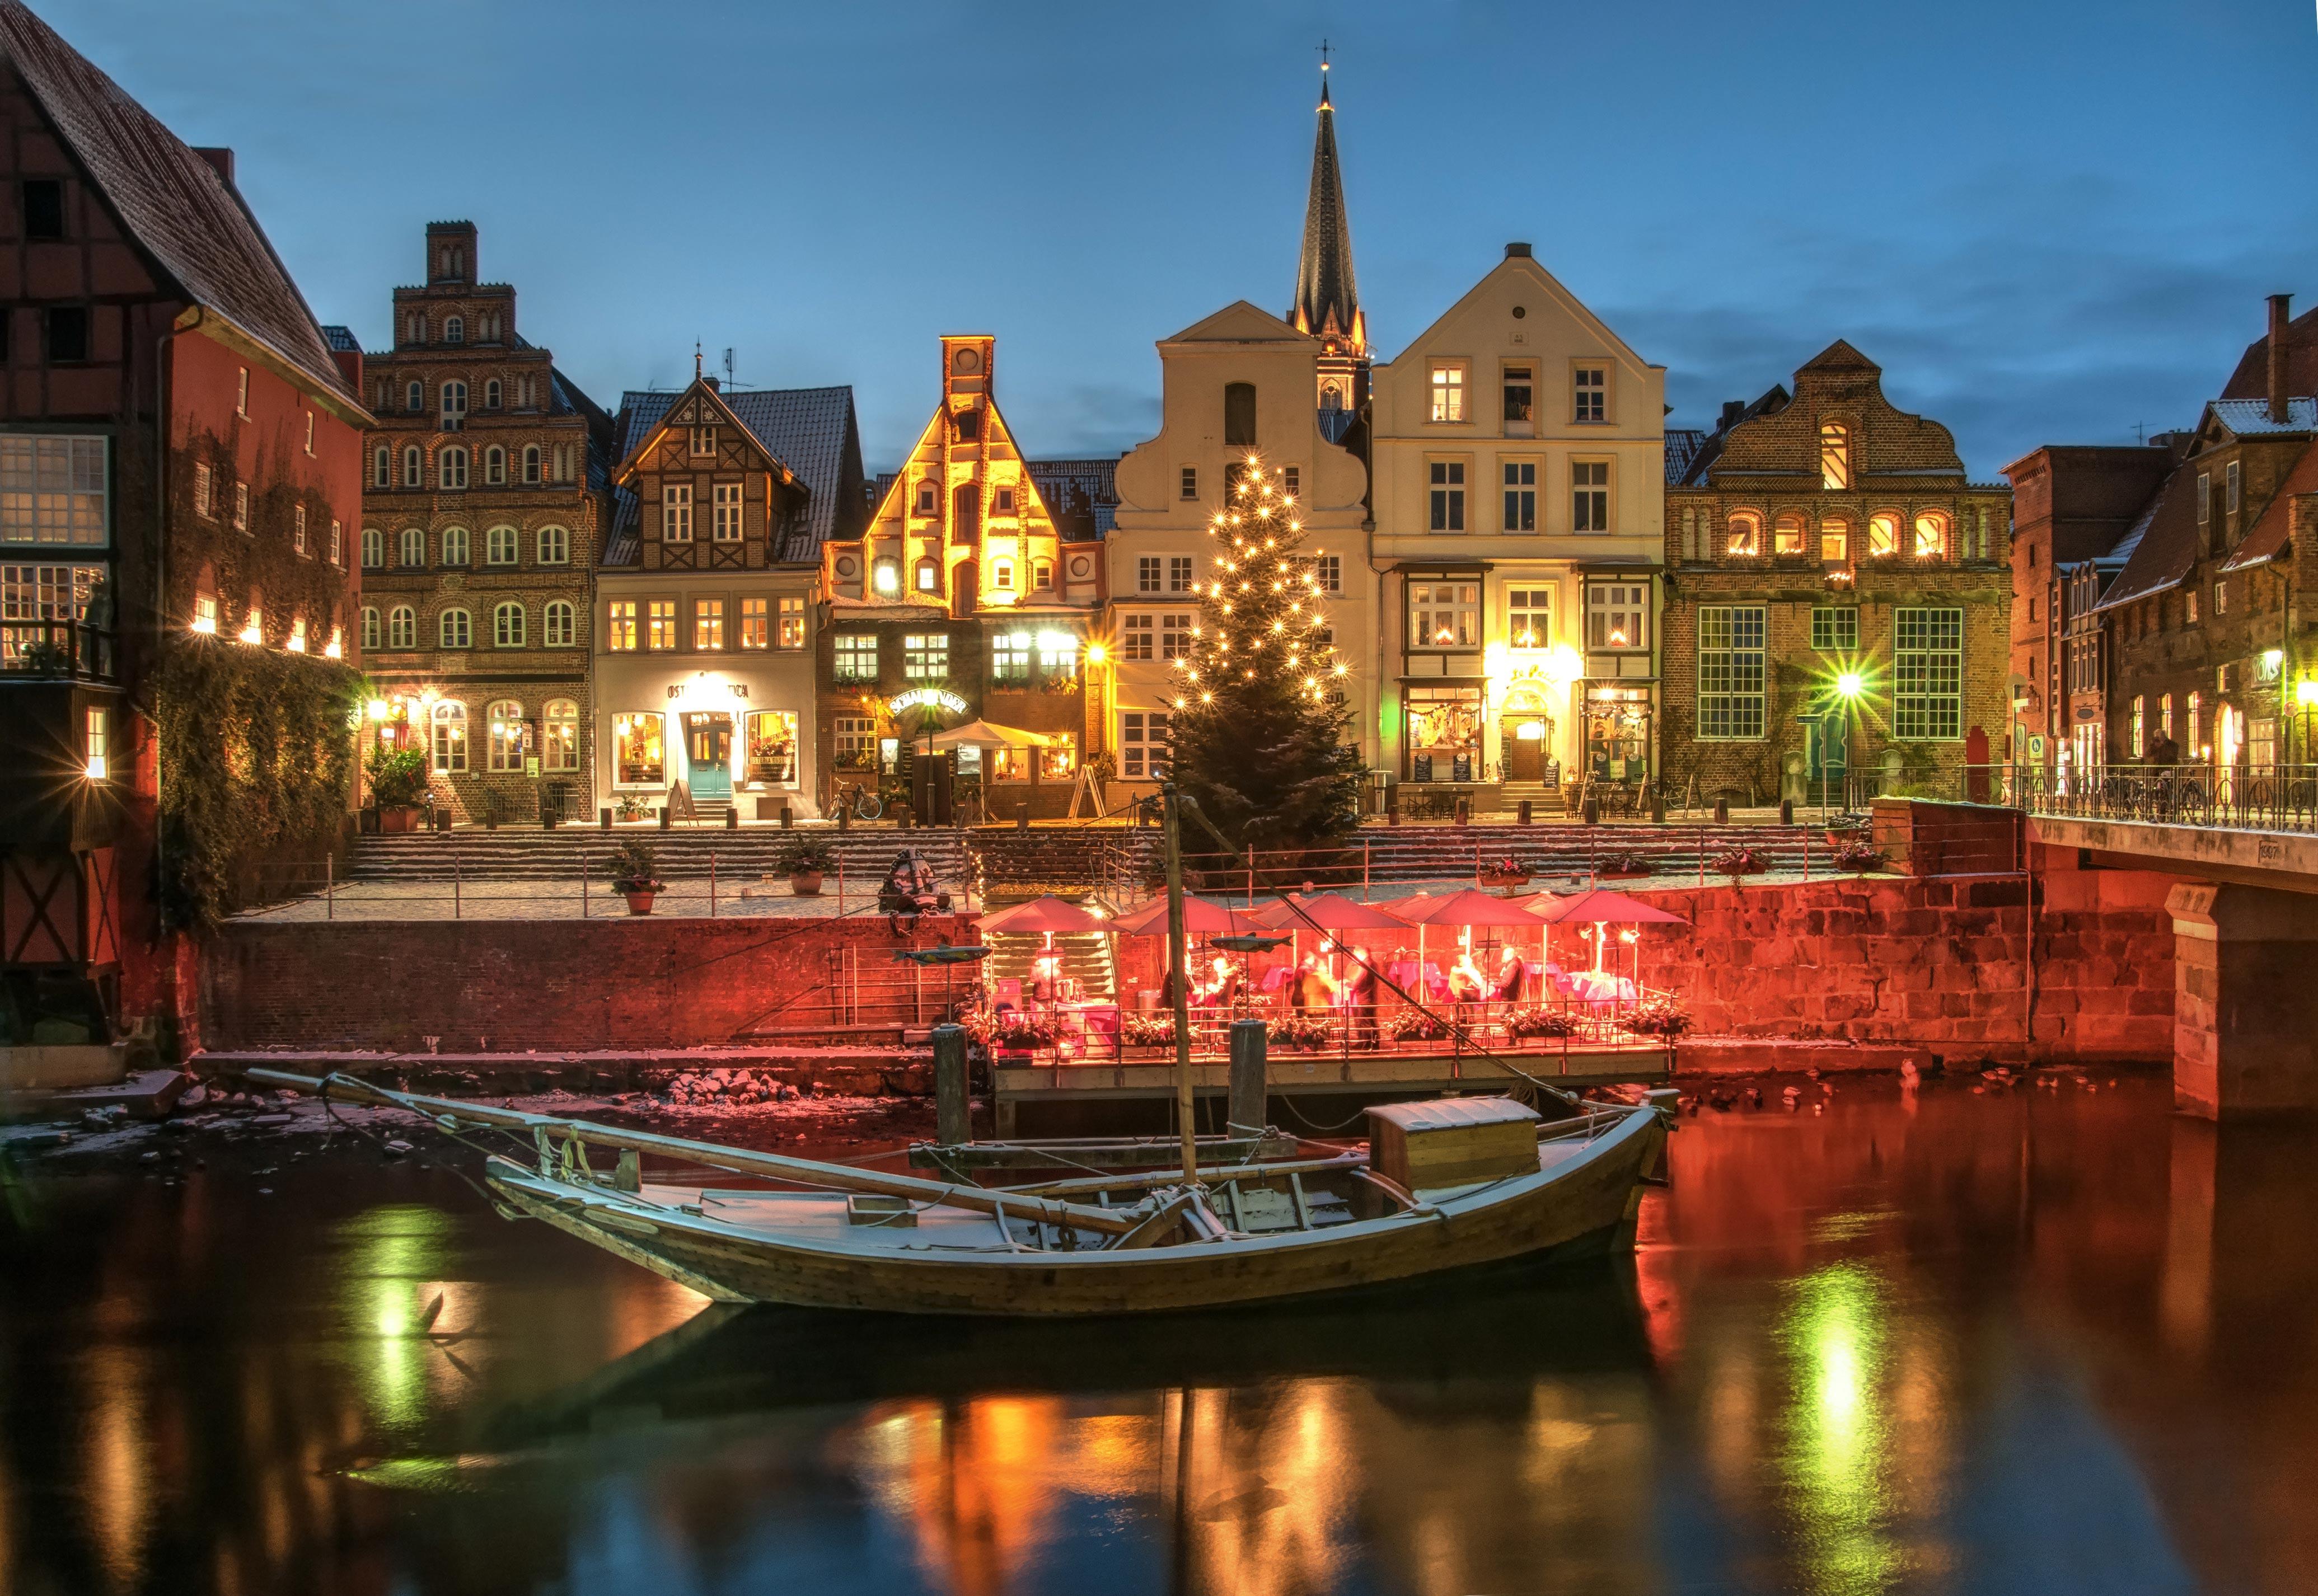 Markt De Lüneburg